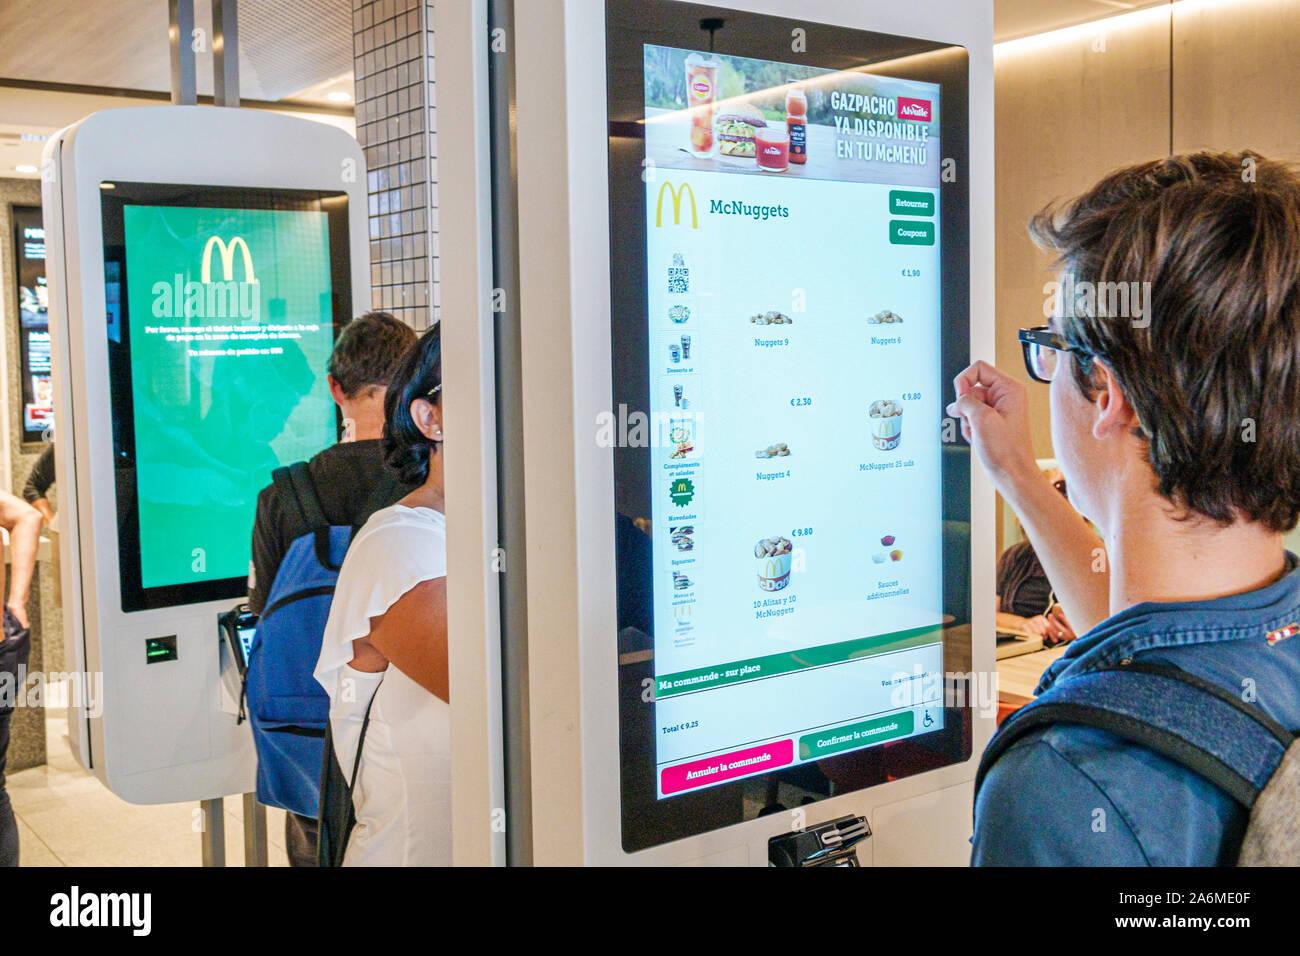 Spanien Barcelona Katalonien Catalunya Plaza de Francesc Macia McDonald's Restaurant Fast Food im Inneren Touchscreen Self-Service Bestellung Kiosk Junge Teenager Spanisch Europa EU Eurozone Stockfoto